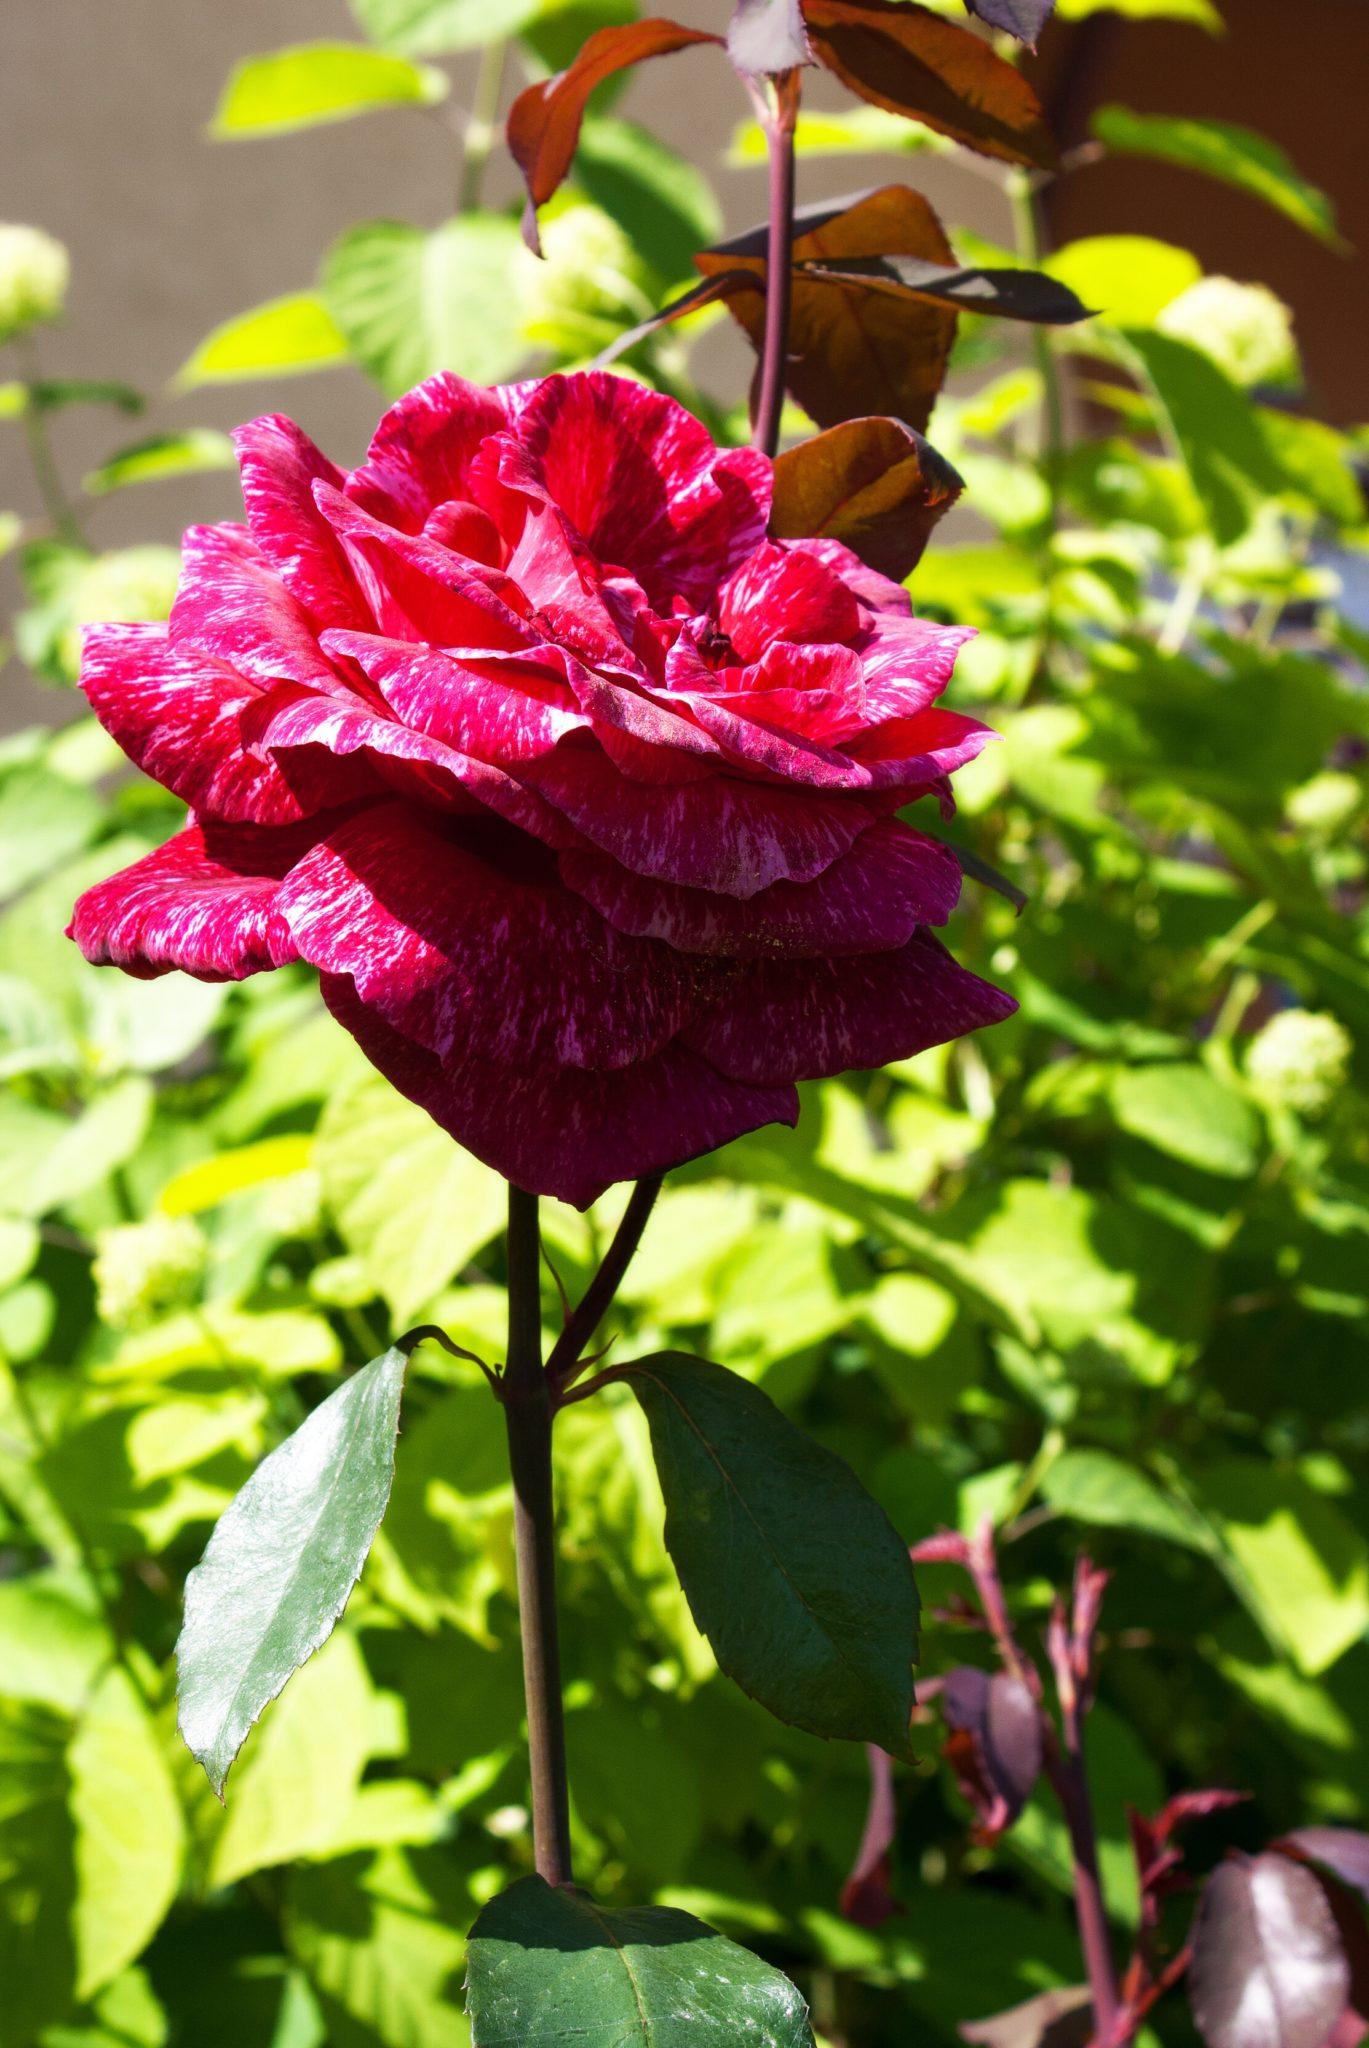 Red rose blooming.